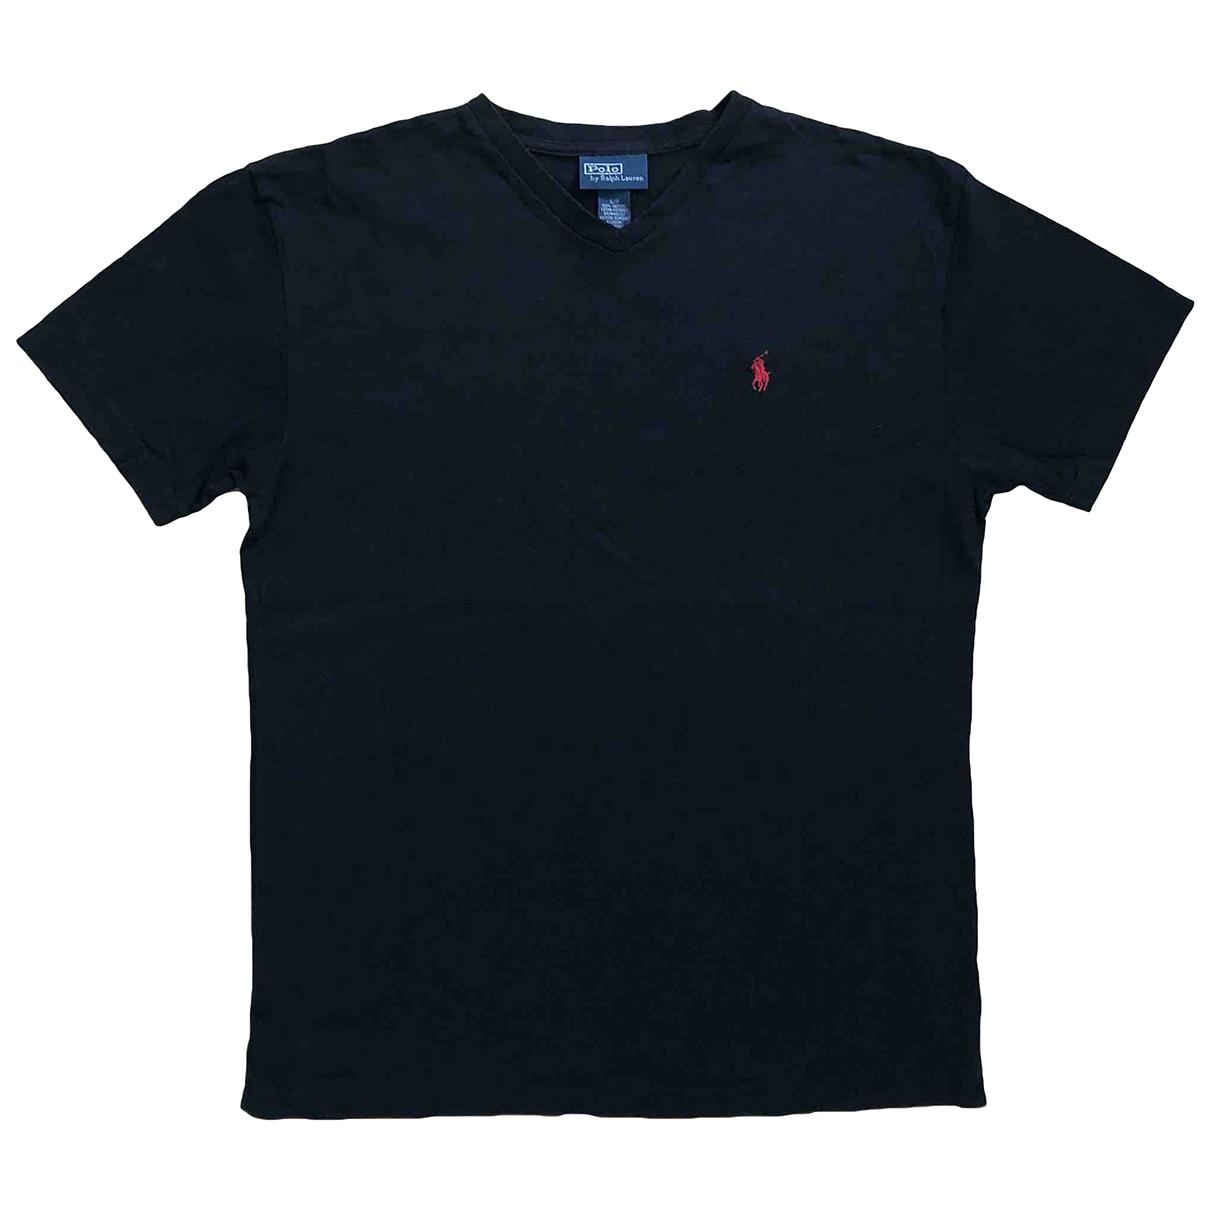 Polo Ralph Lauren N Black Cotton T-shirts for Men S International